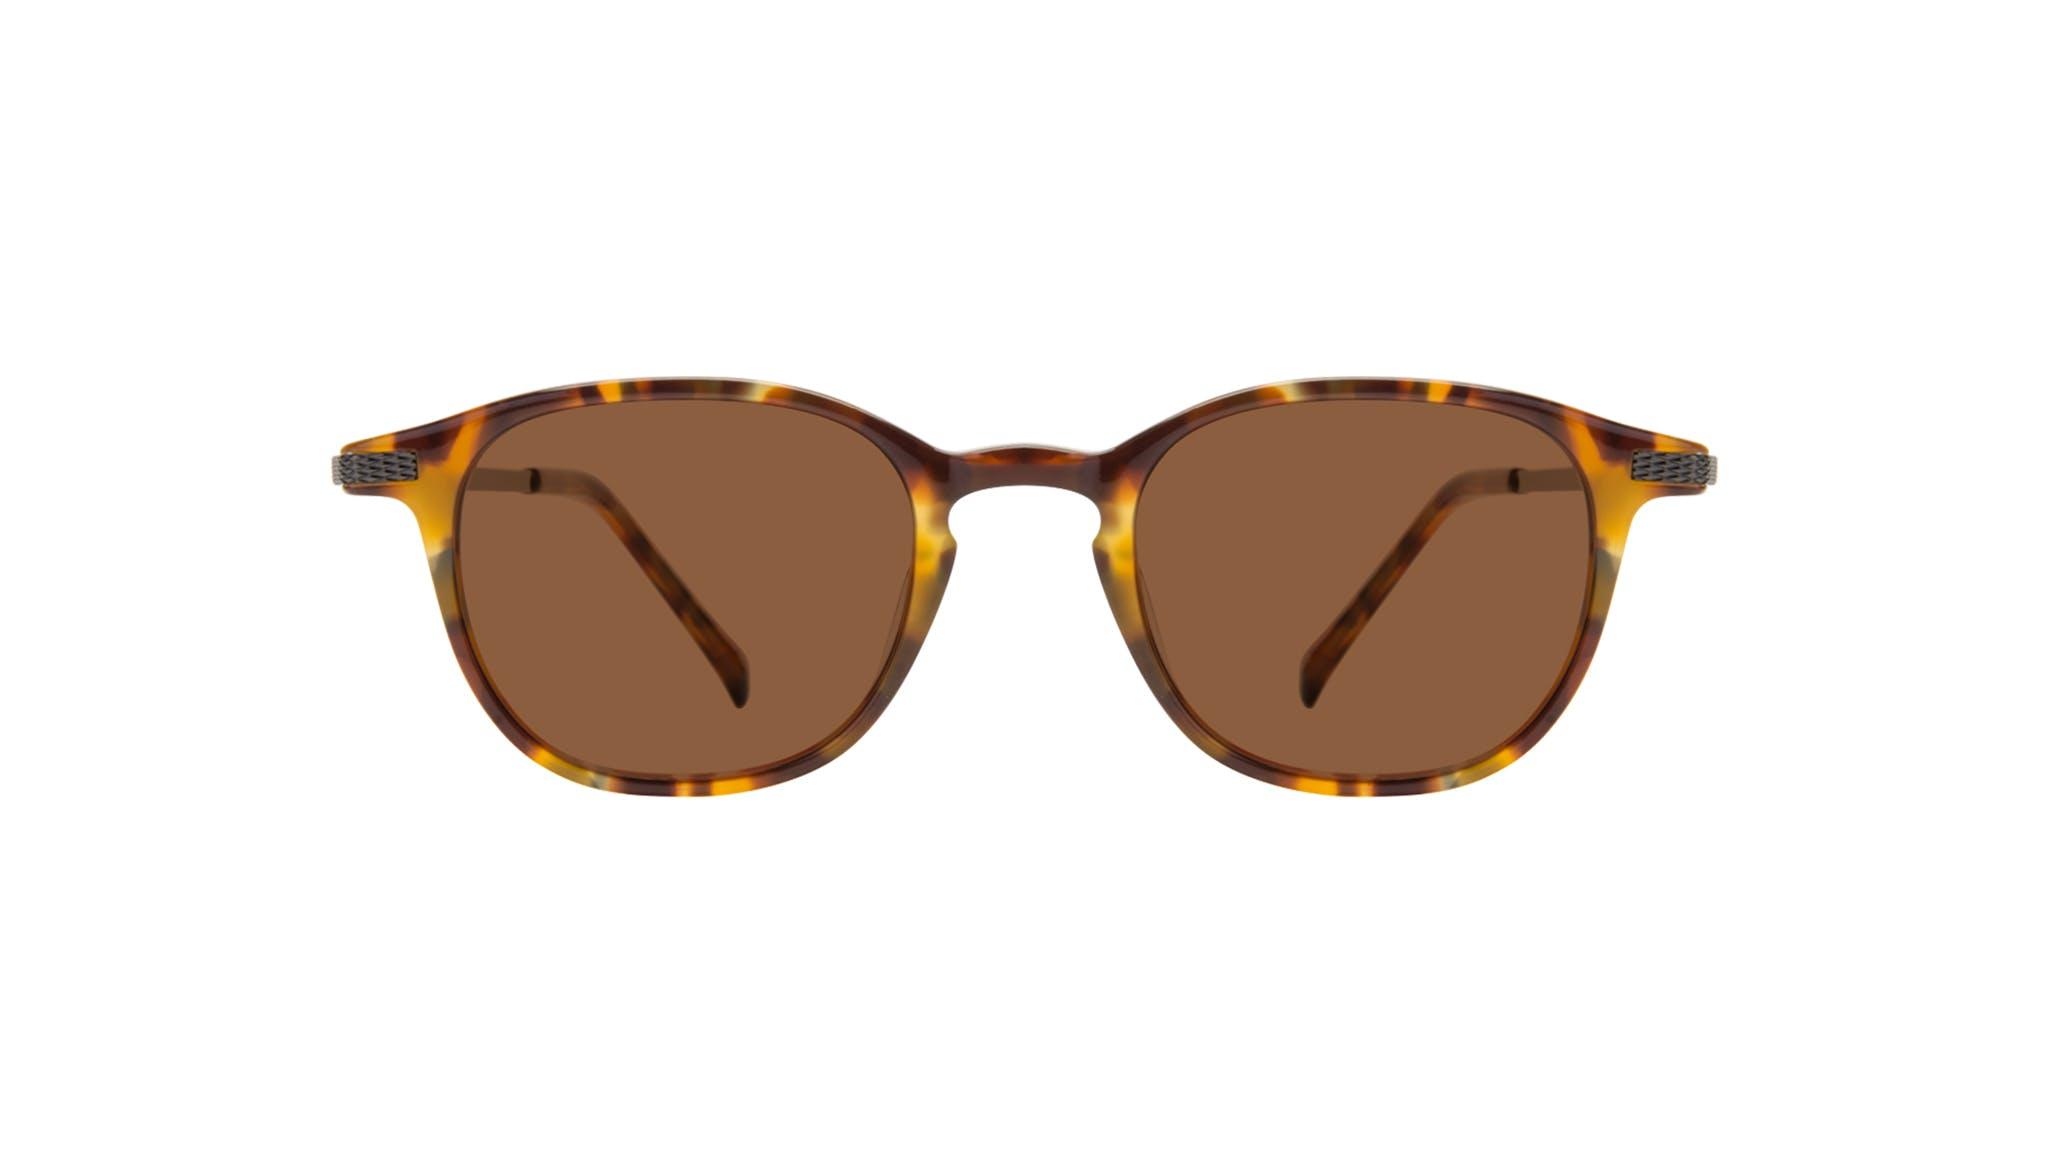 Affordable Fashion Glasses Round Sunglasses Men Tux Havana Tort